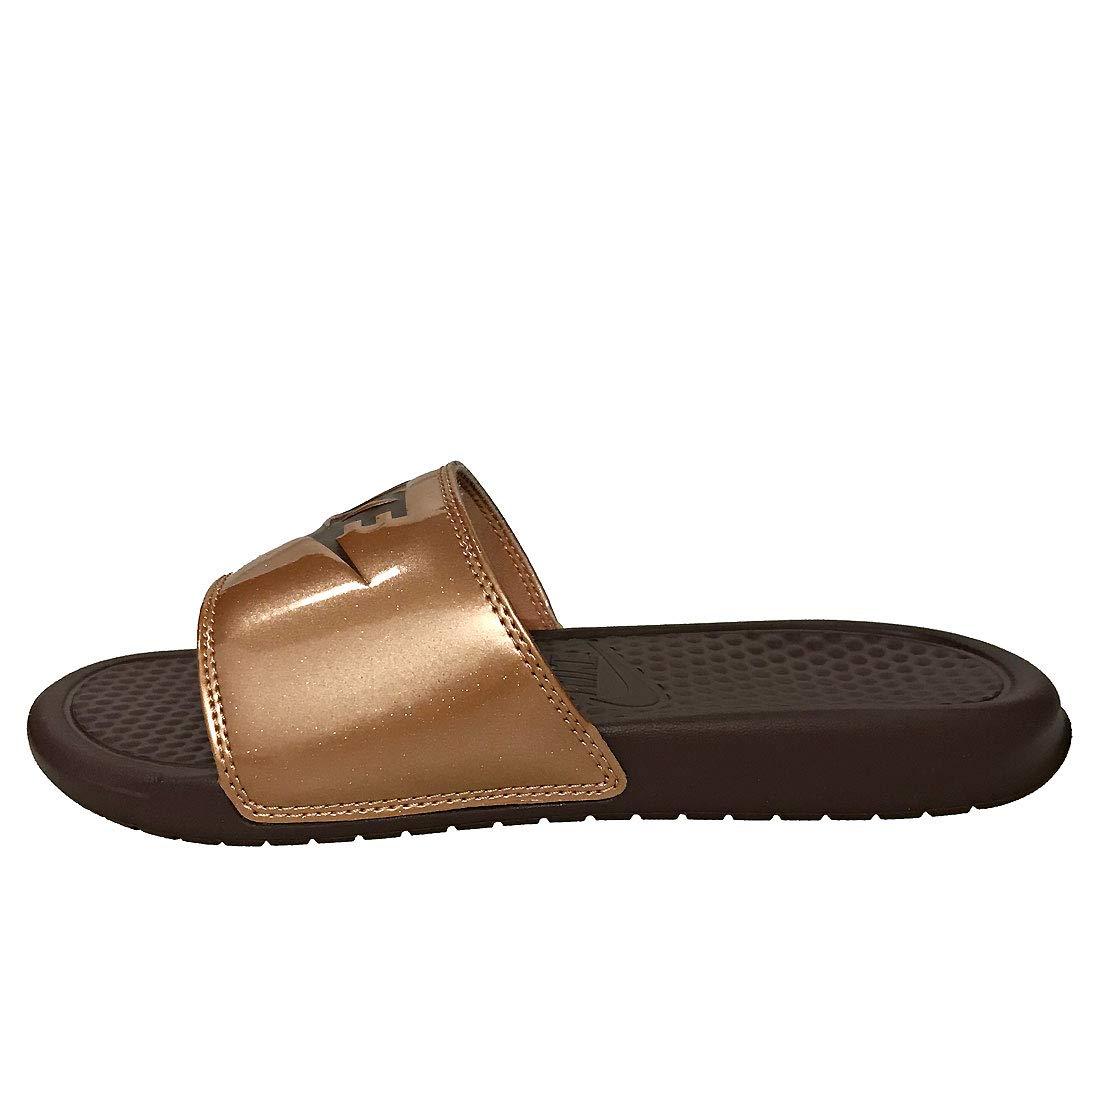 best website 53282 02988 Nike WMNS Benassi JDI Print, Chaussures de Plage   Piscine Femme